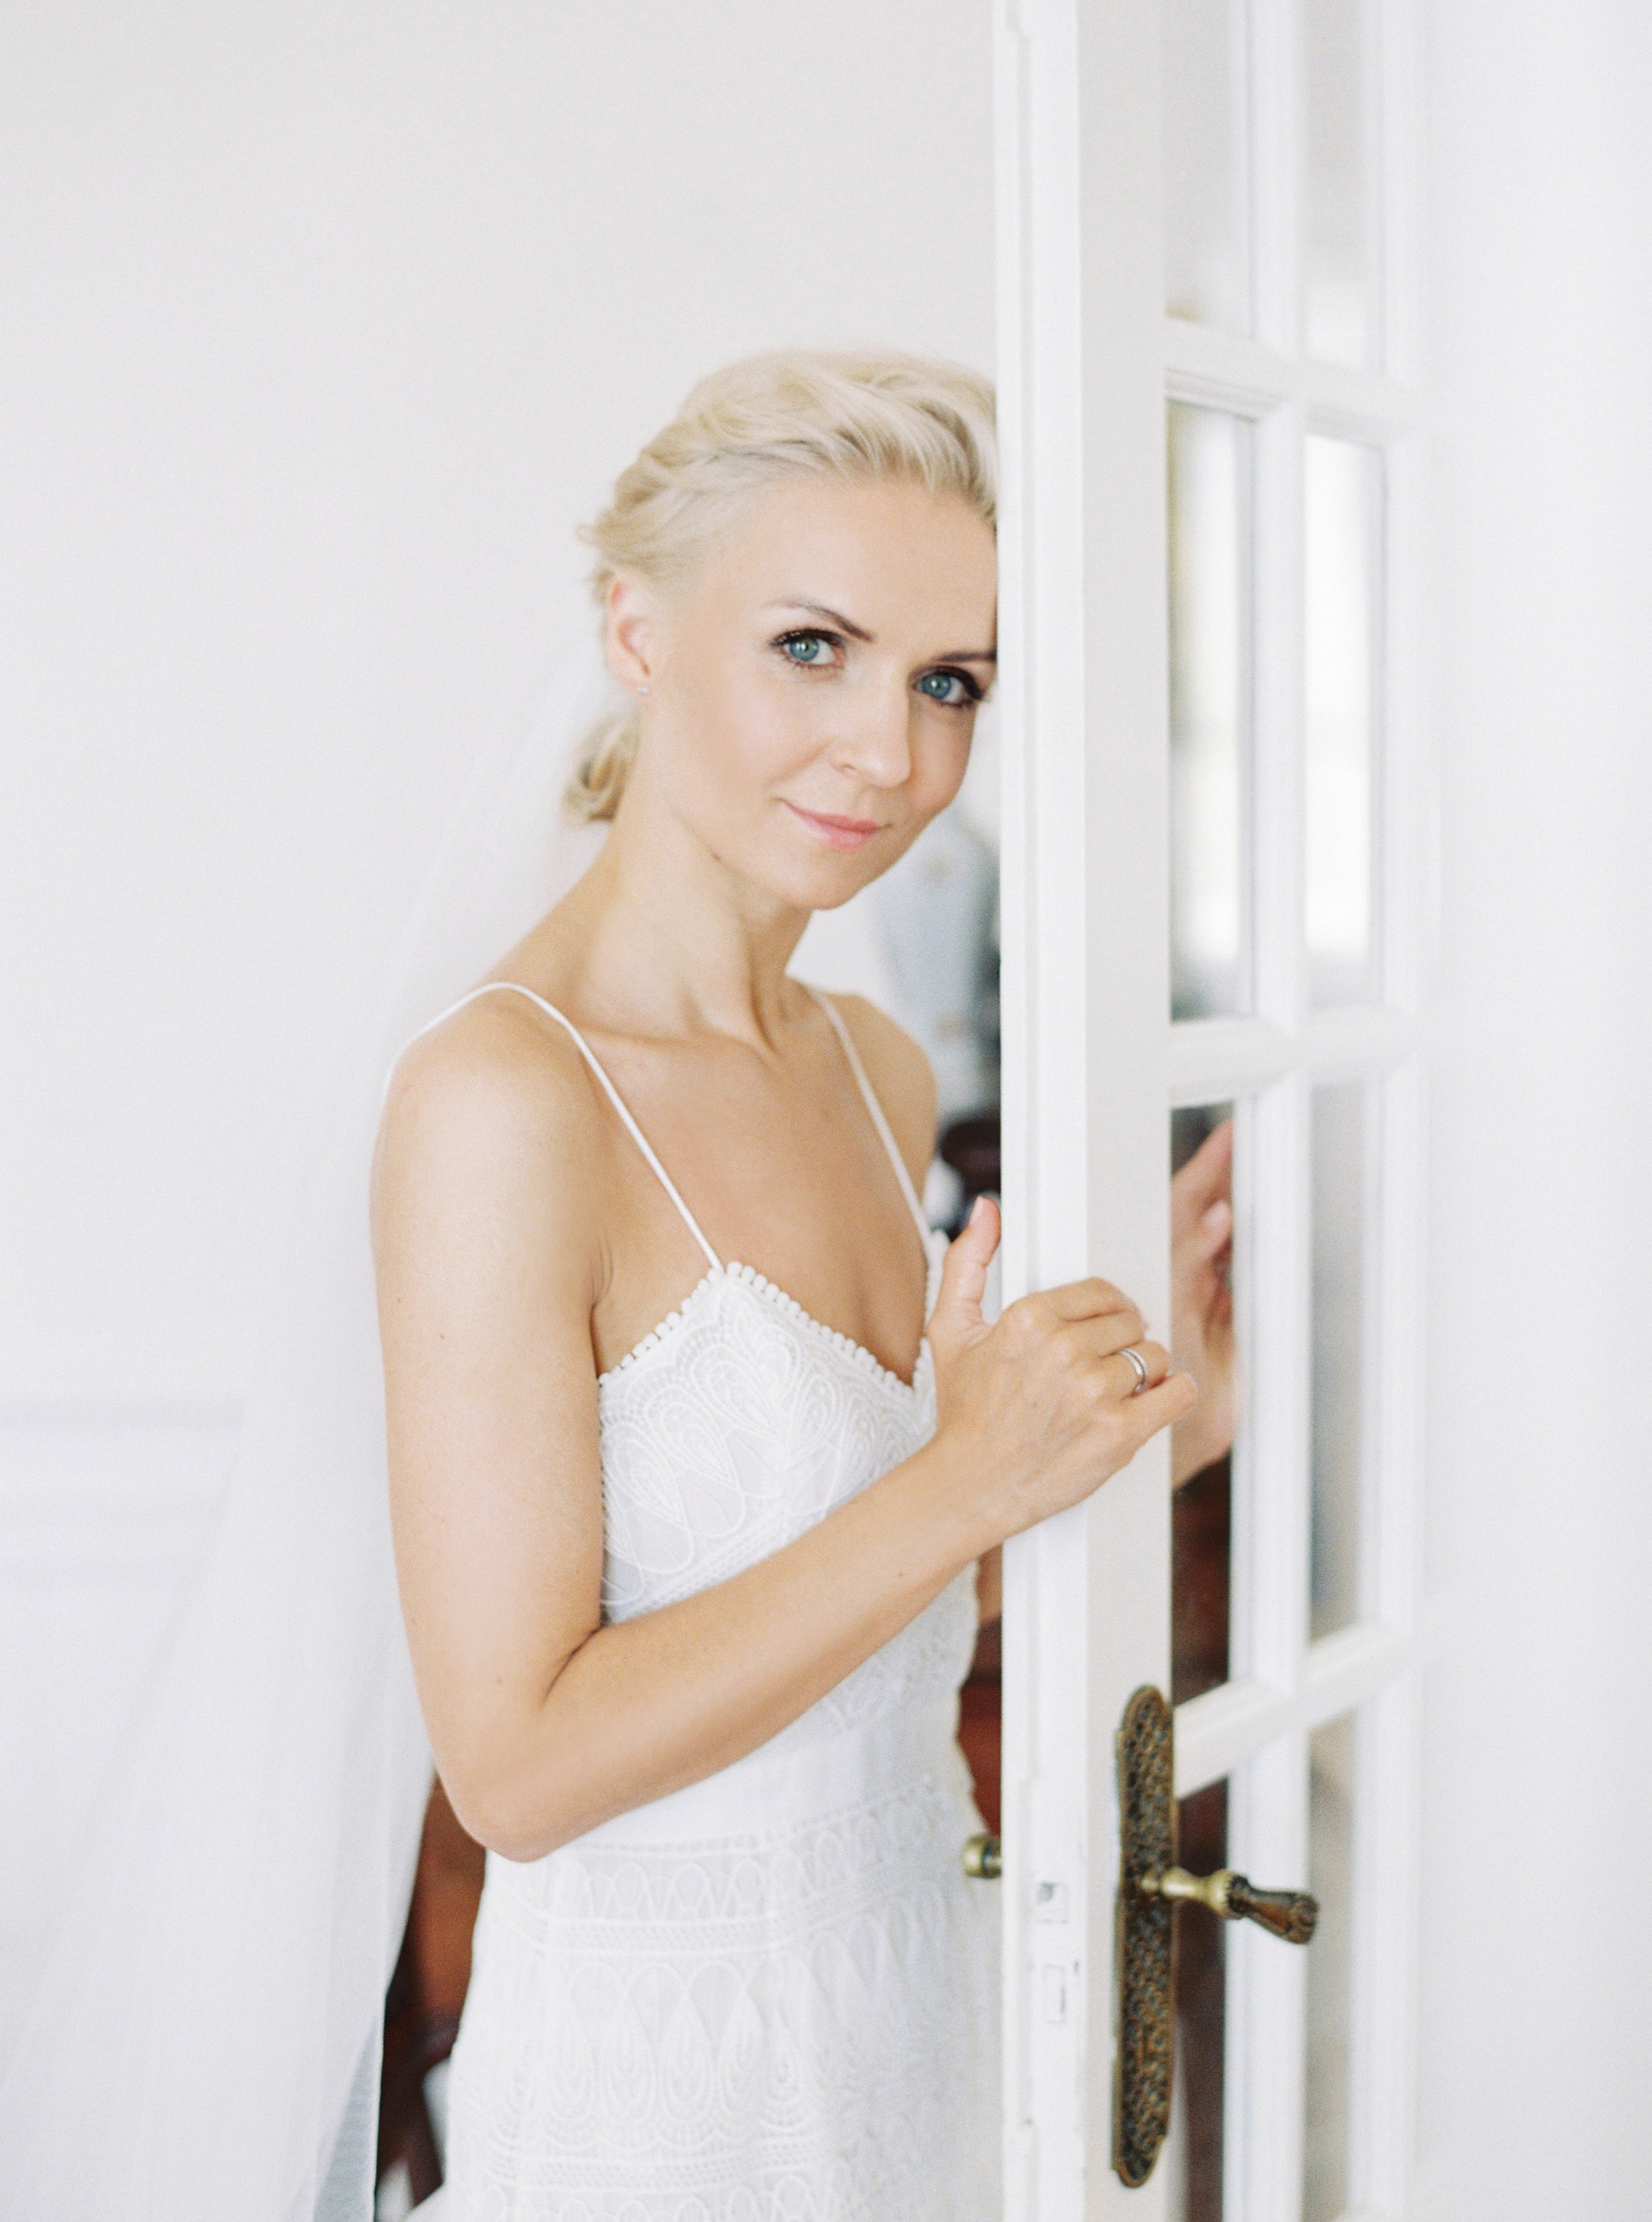 Nastia_Vesna_Photography_Wedding_Portugal_13.jpg